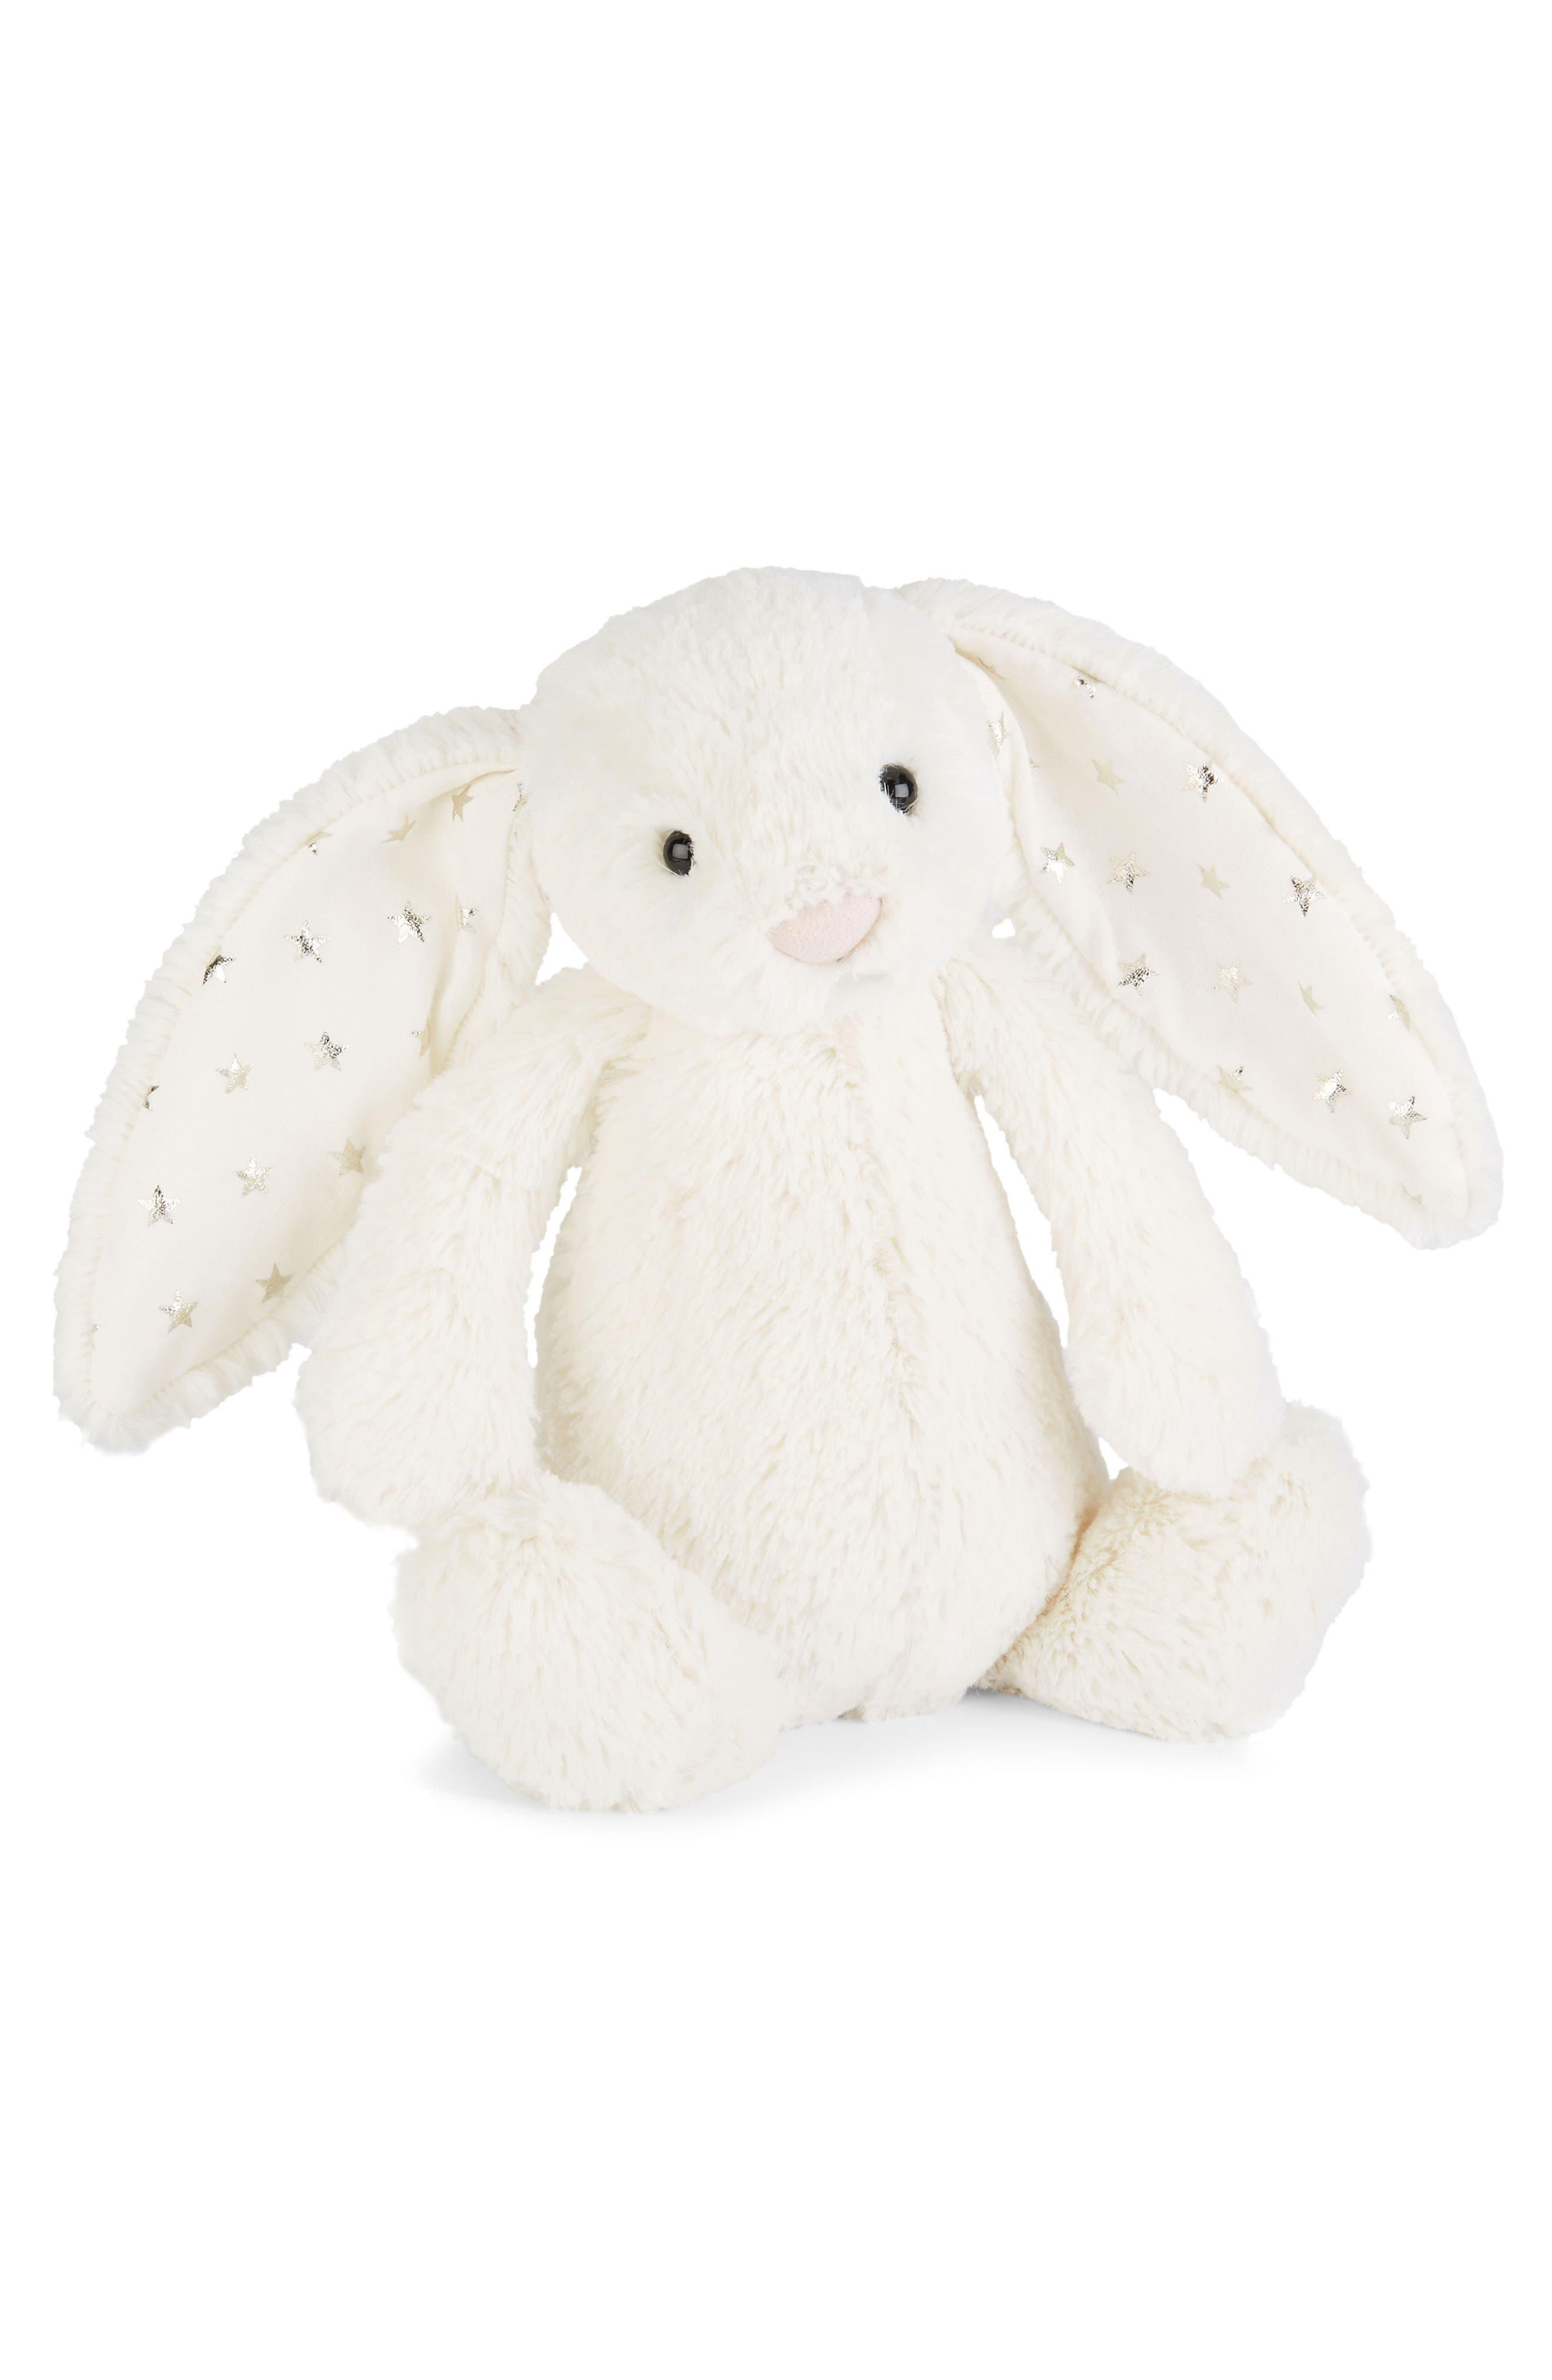 Alternate Image 1 Selected - Jellycat Twinkle Bunny Stuffed Animal